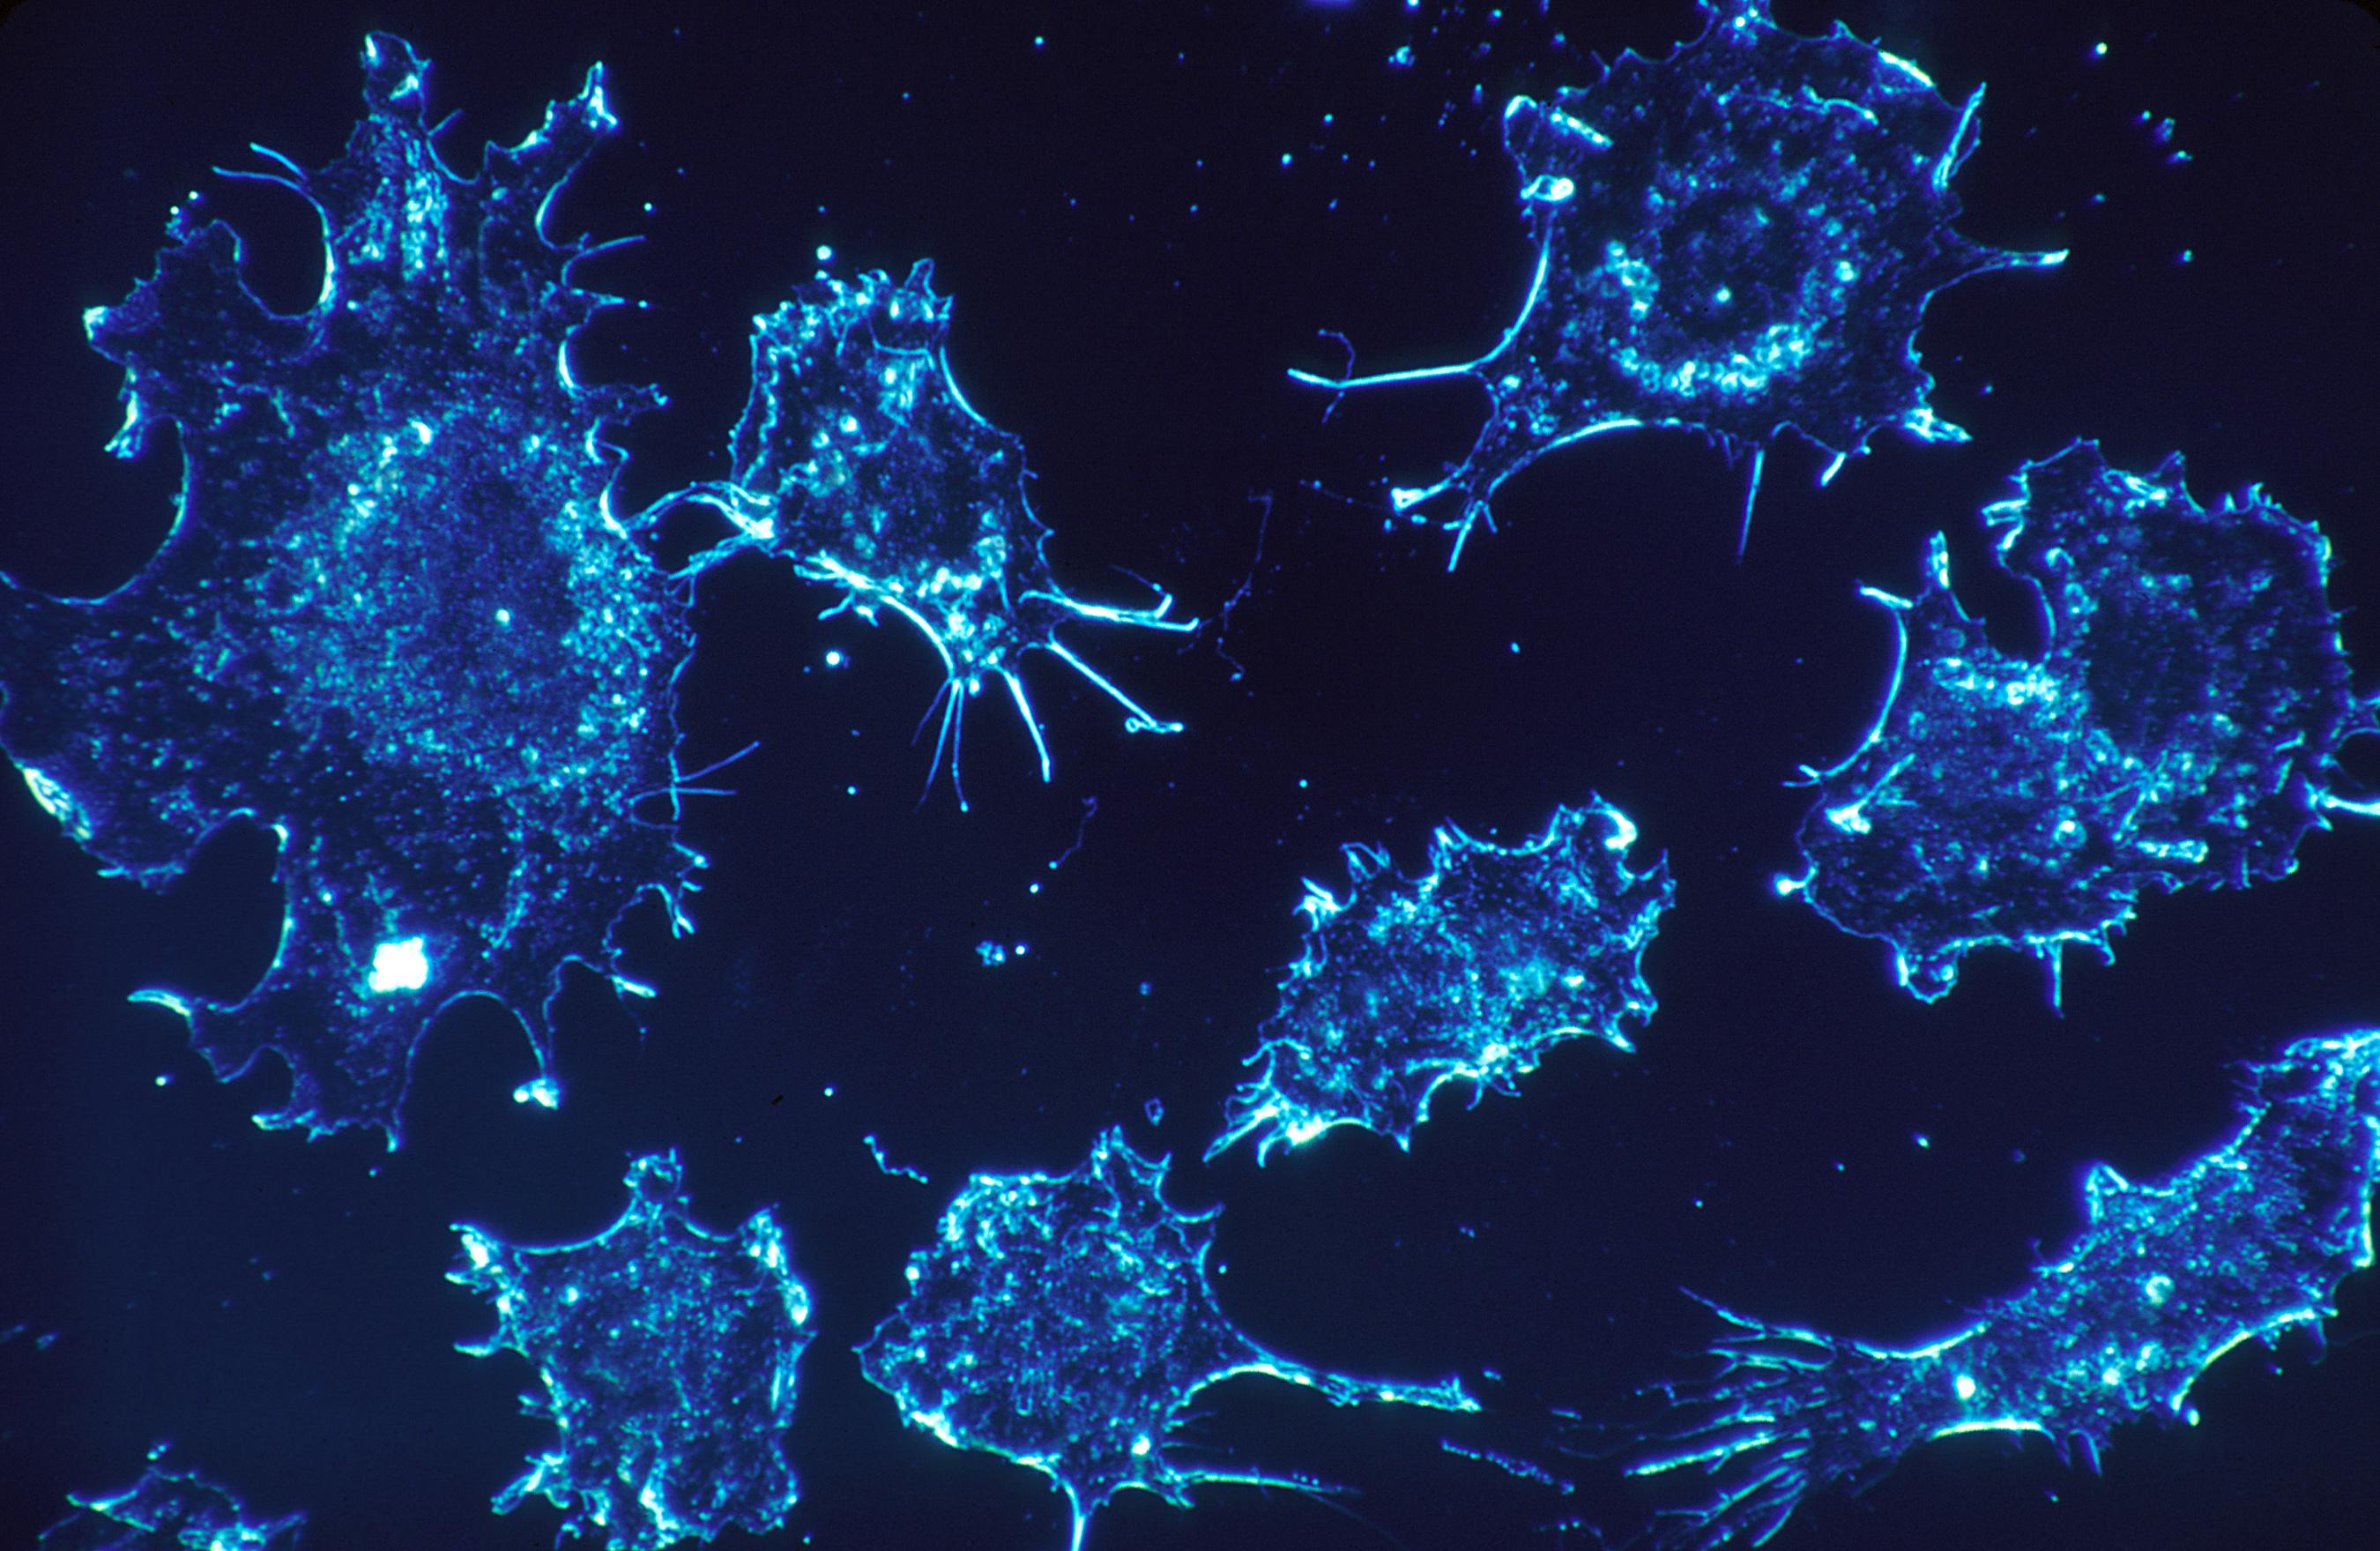 VA plans massive expansion of cancer treatment options